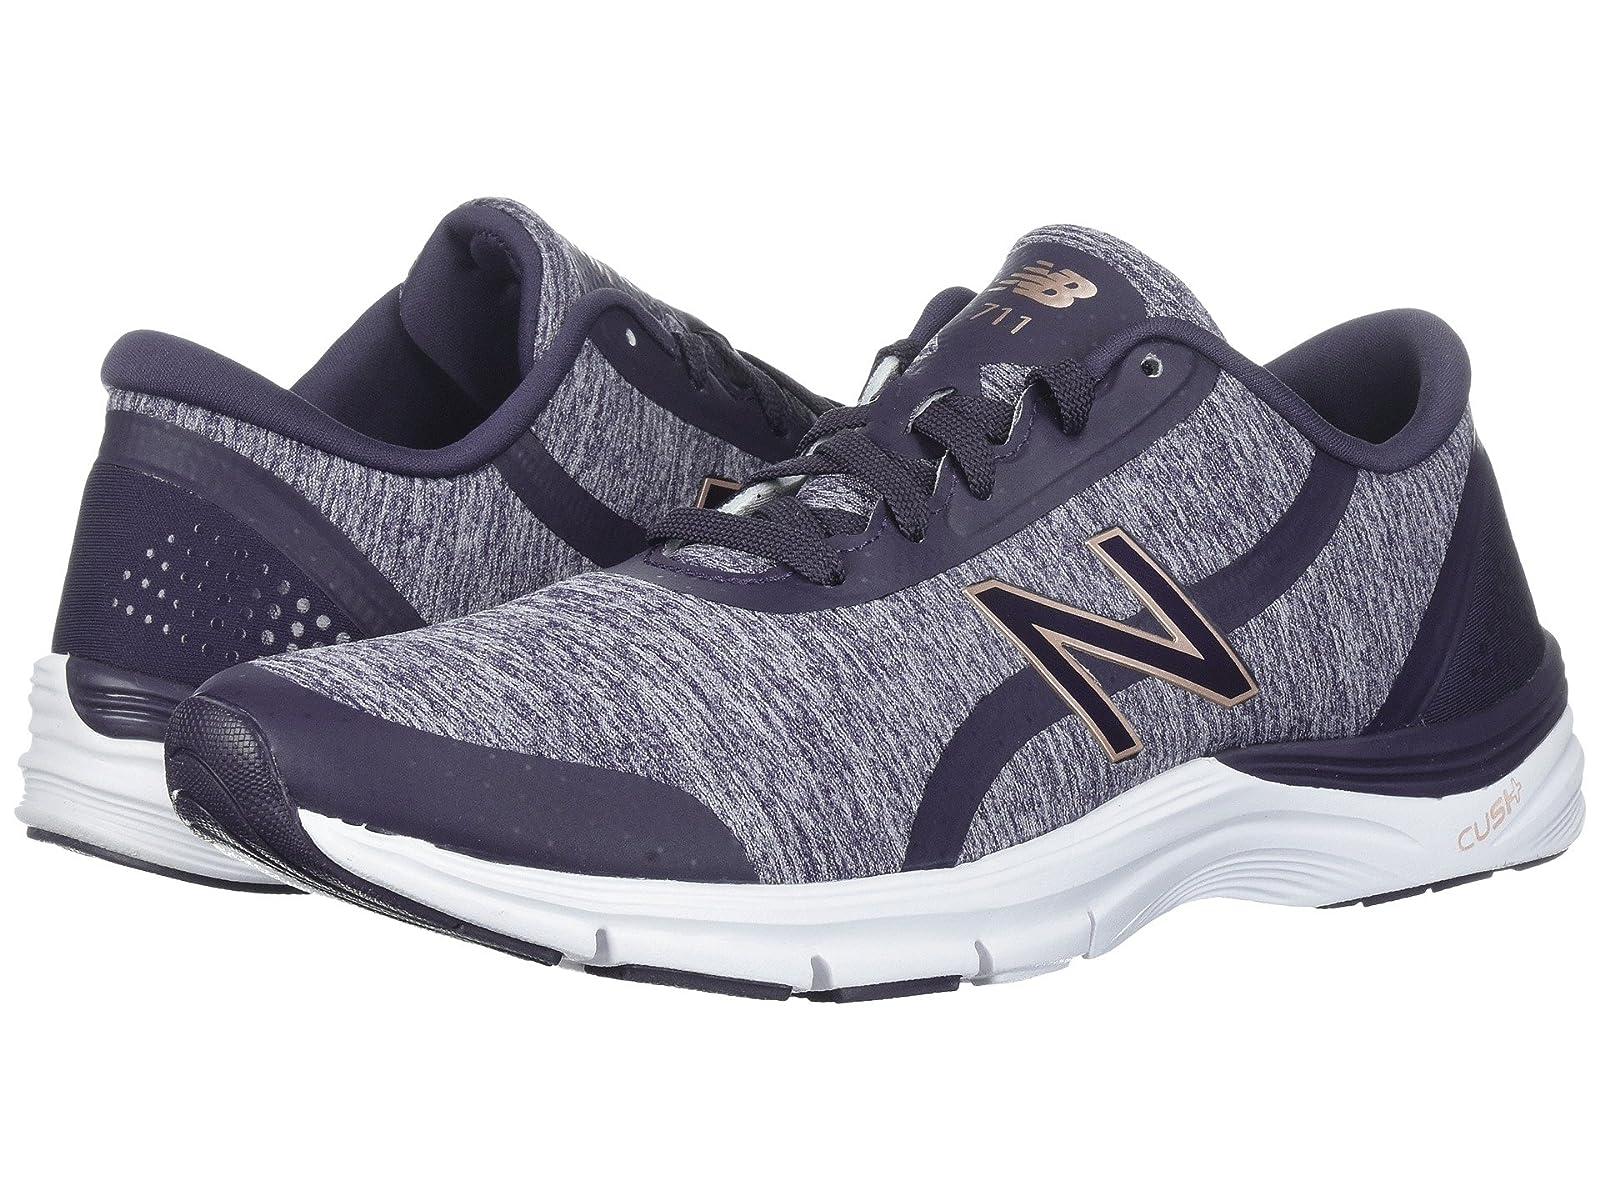 New Balance WX711v3Atmospheric grades have affordable shoes